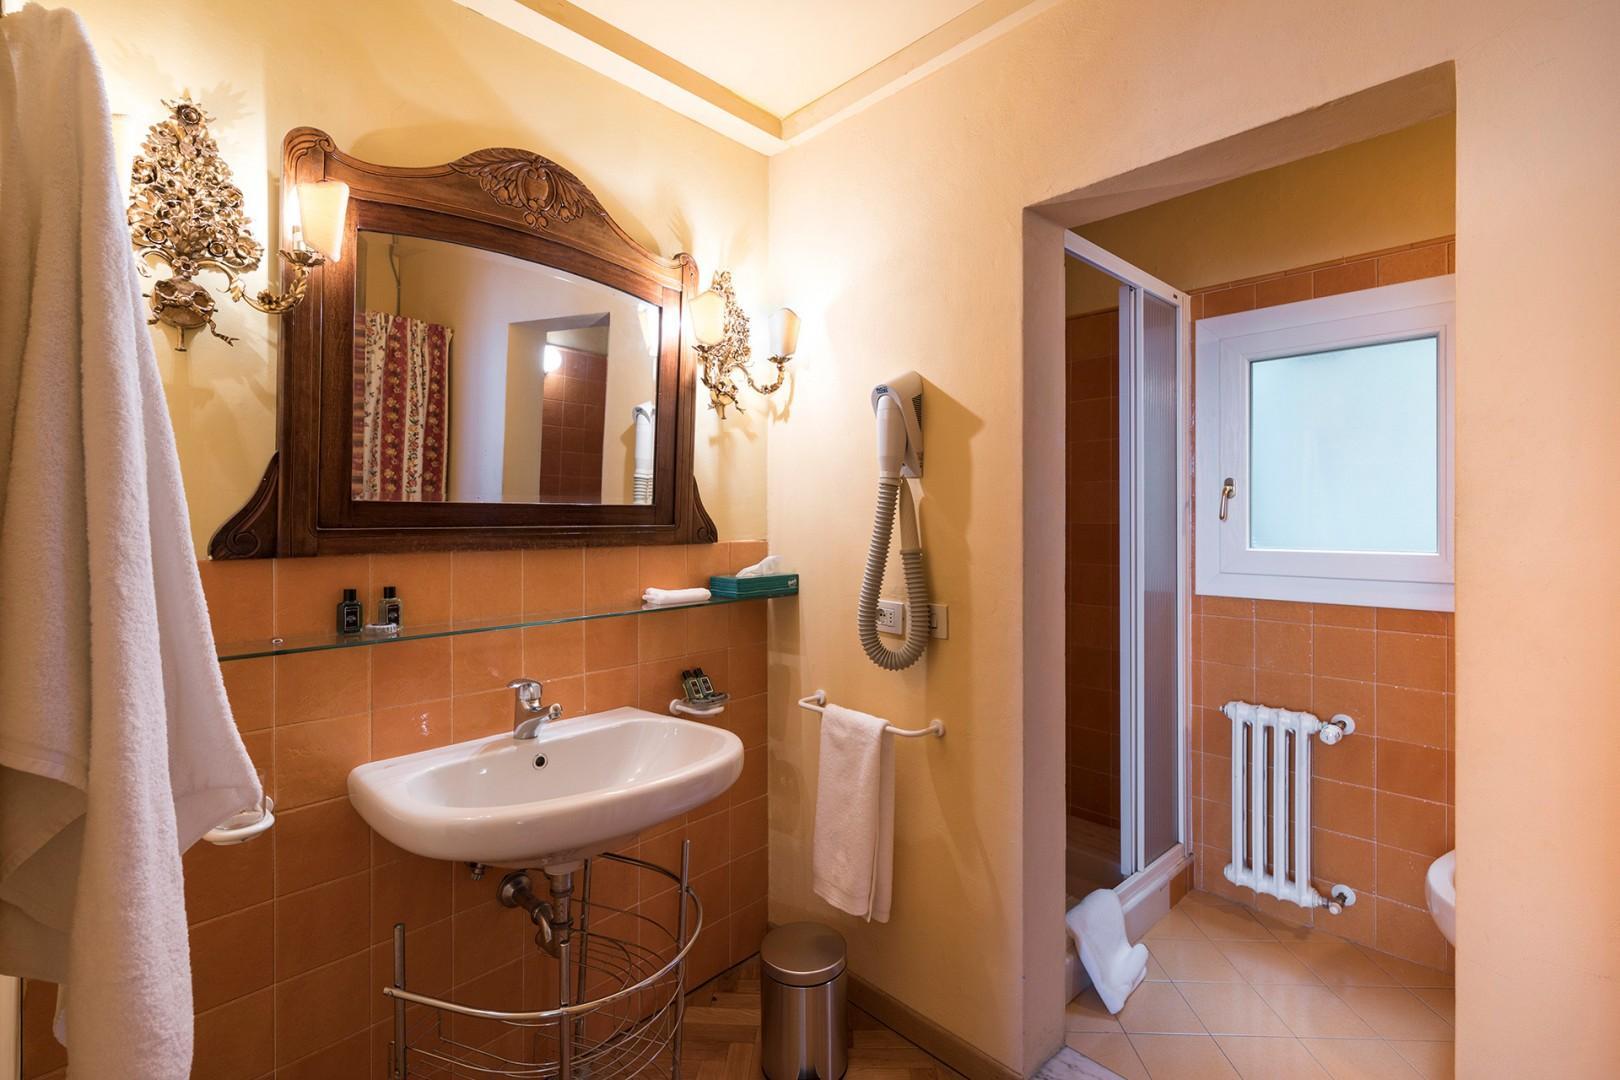 Bathroom 1 is en suite to bedroom 1 with a shower, sink, toilet and bidet.